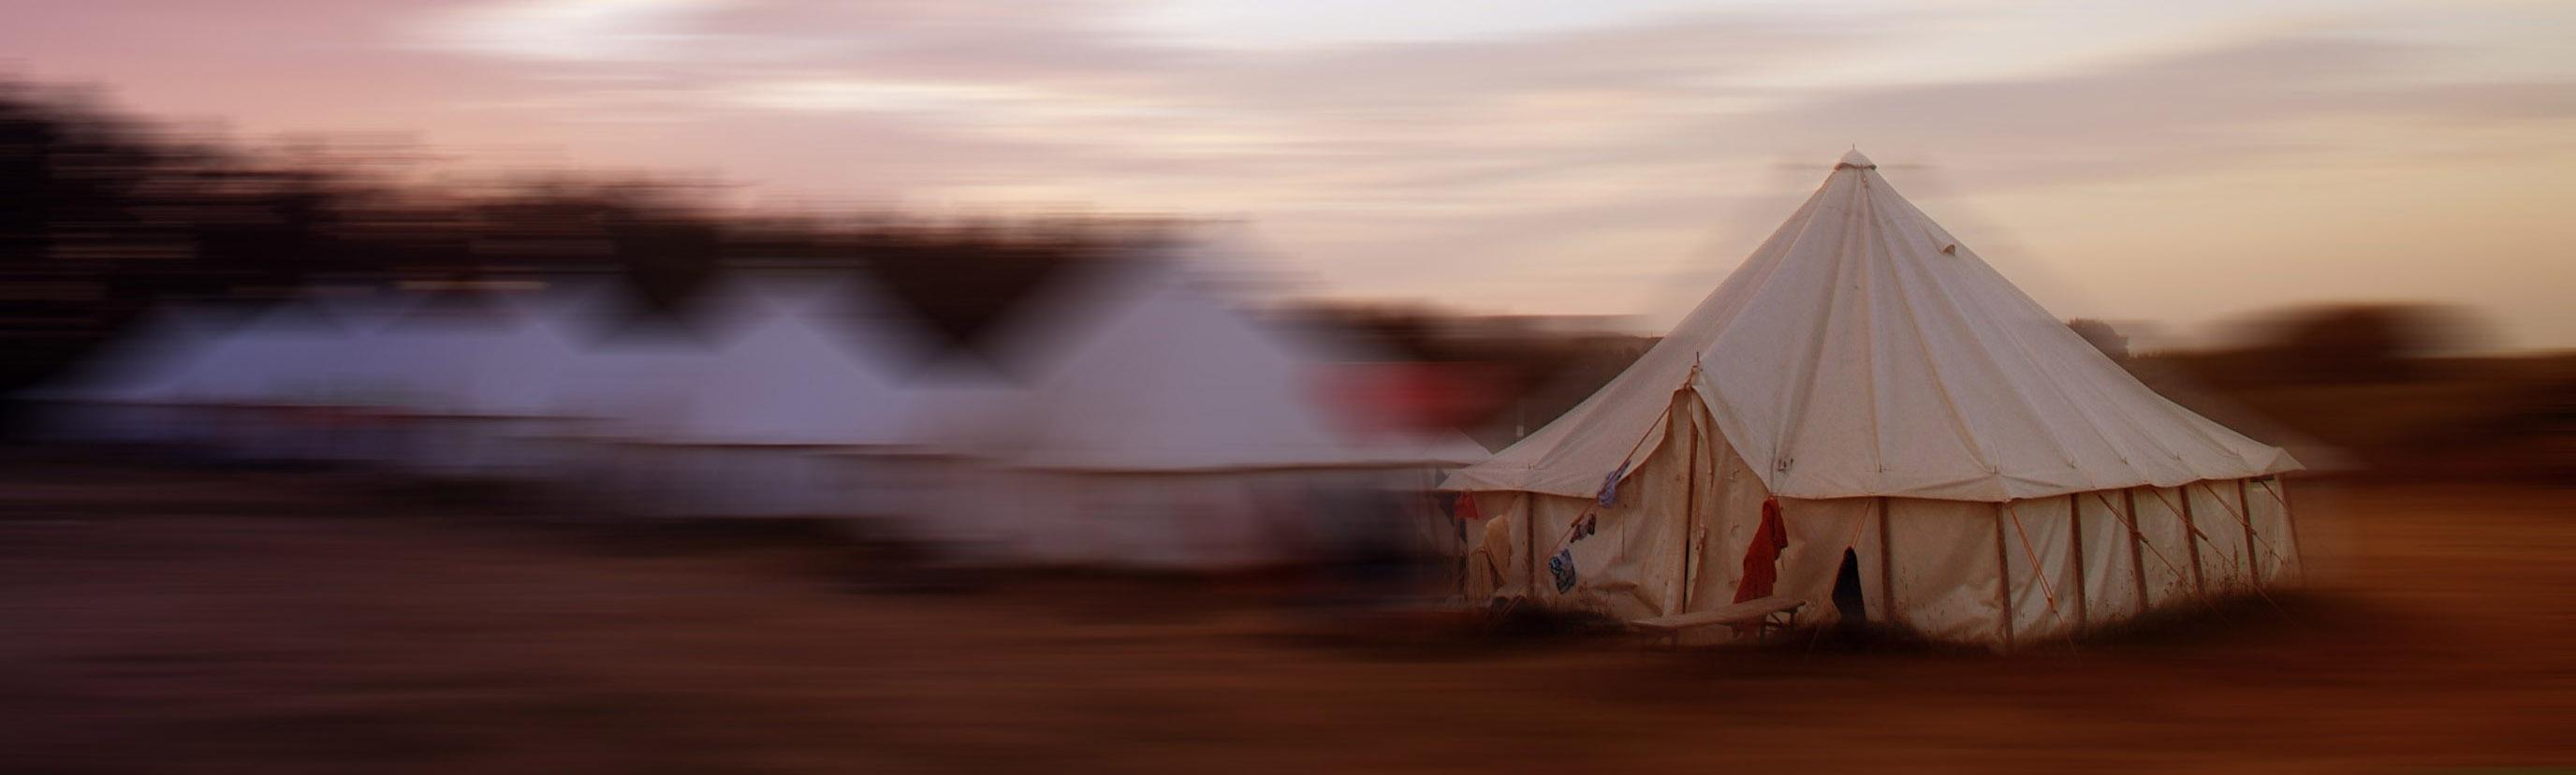 Zeltlager Rantum Zwei